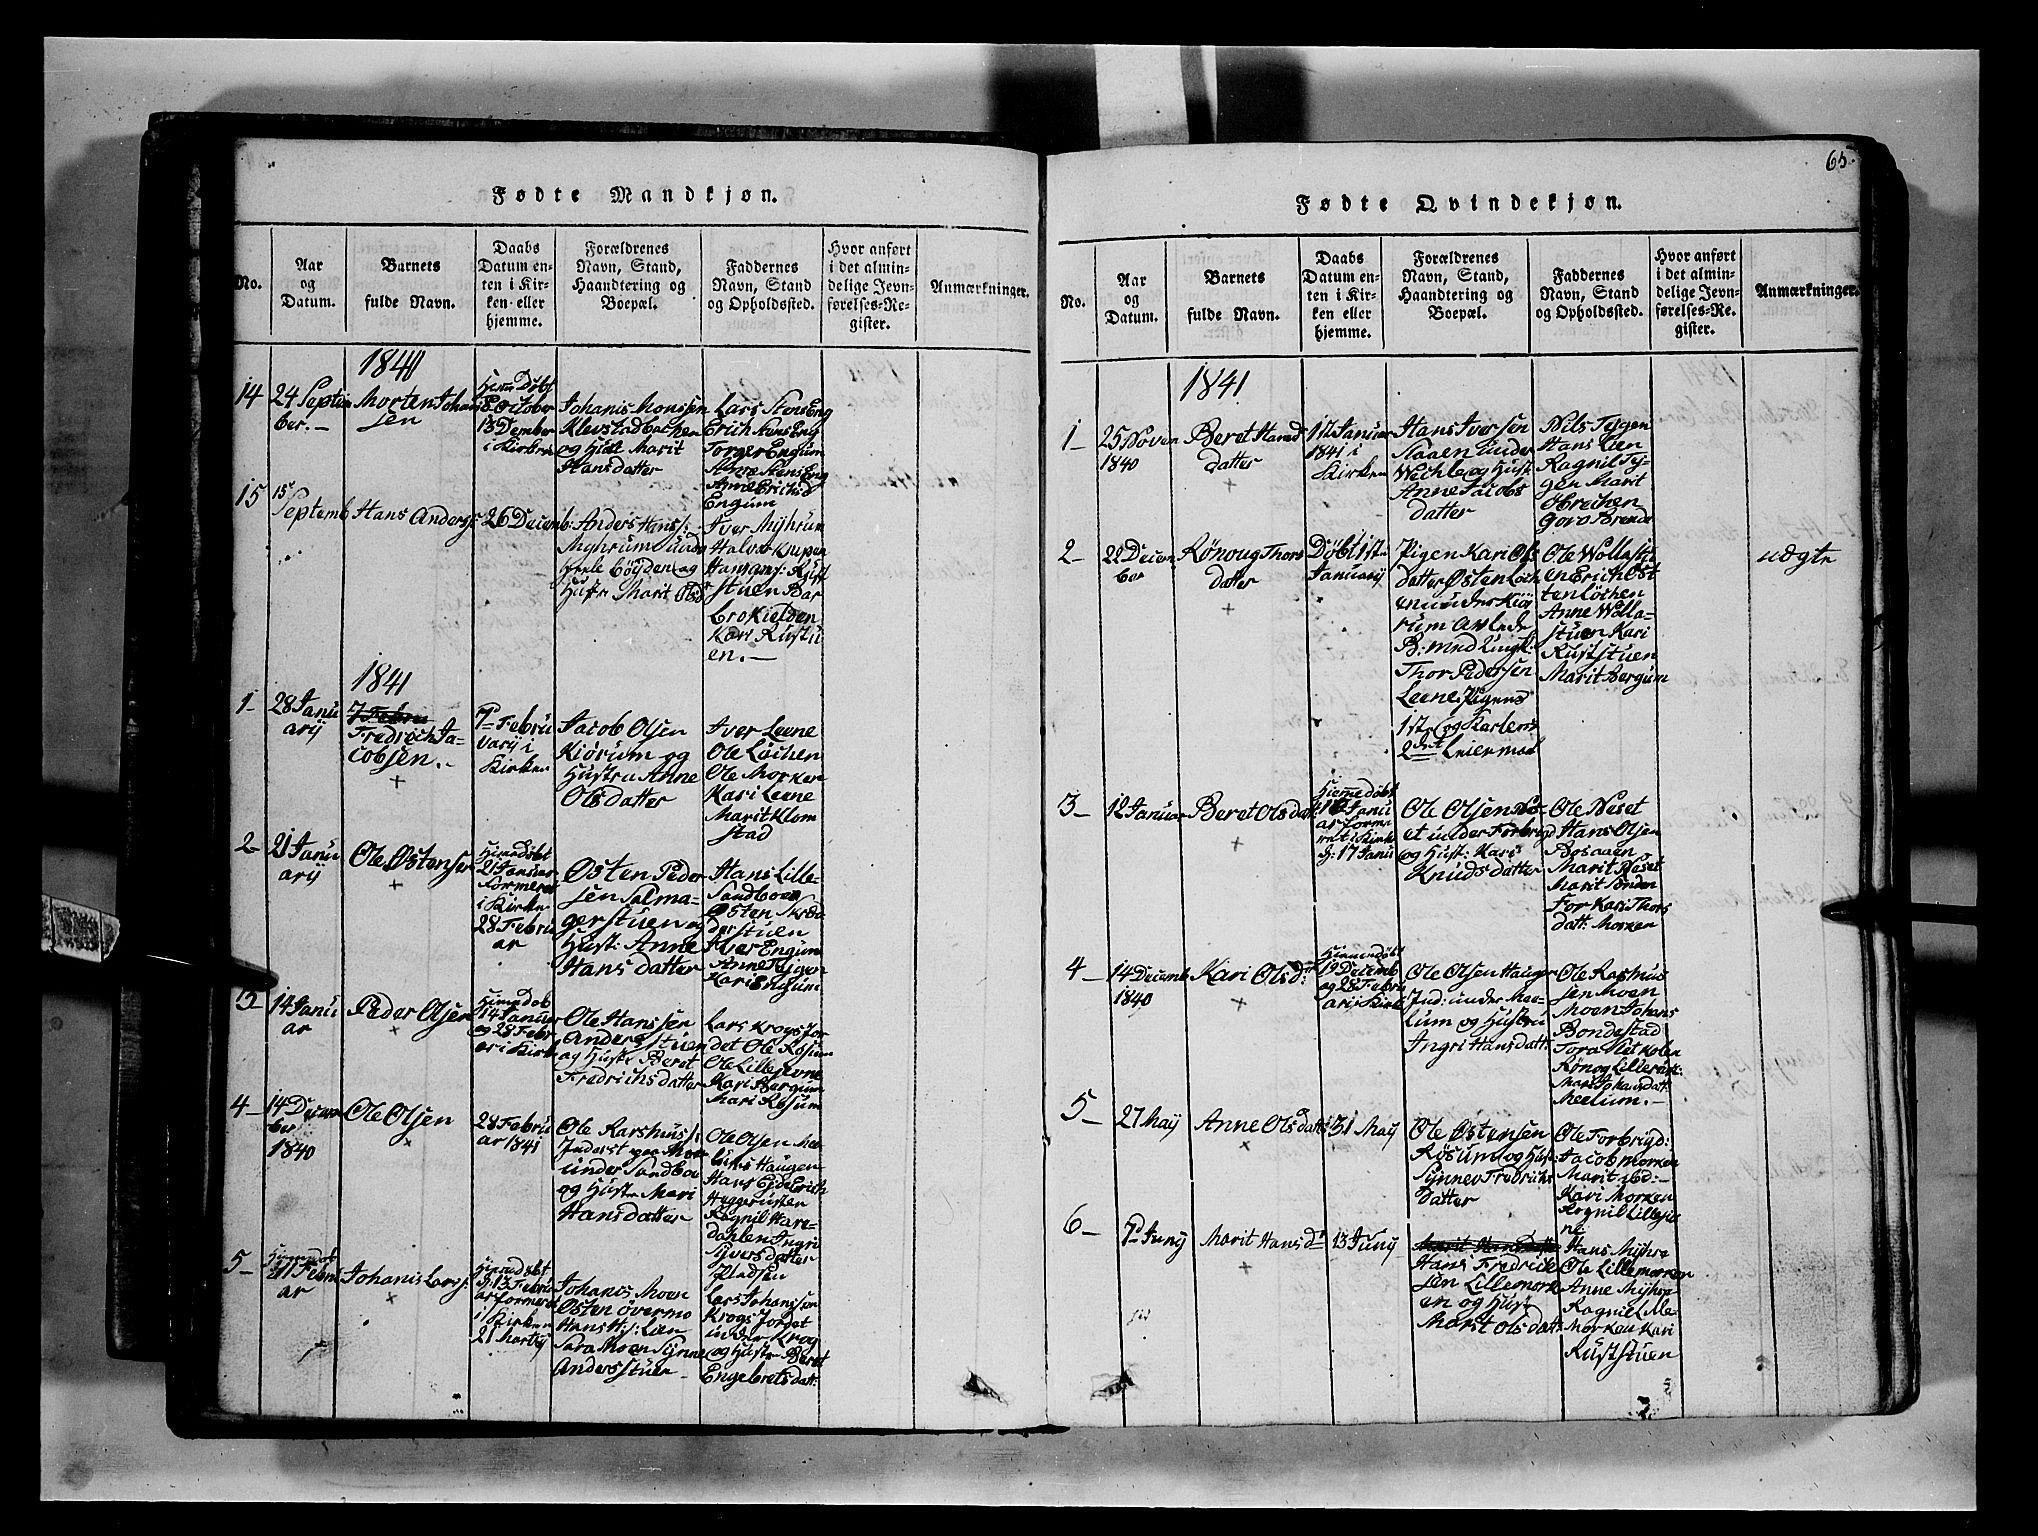 SAH, Fron prestekontor, H/Ha/Hab/L0002: Klokkerbok nr. 2, 1816-1850, s. 65